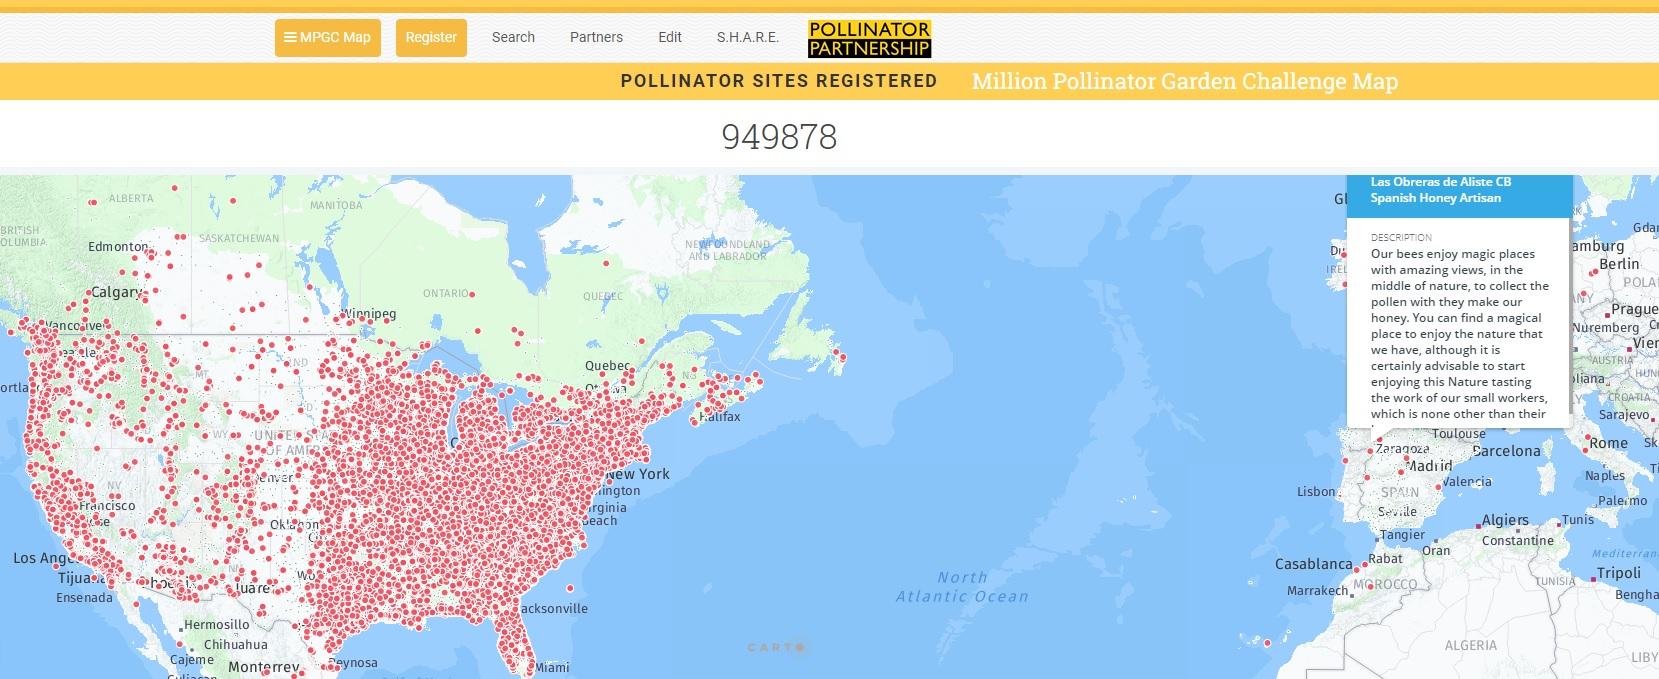 Million Pollinator Garden Challenge Las Obreras de Aliste CB Artesanos de la miel